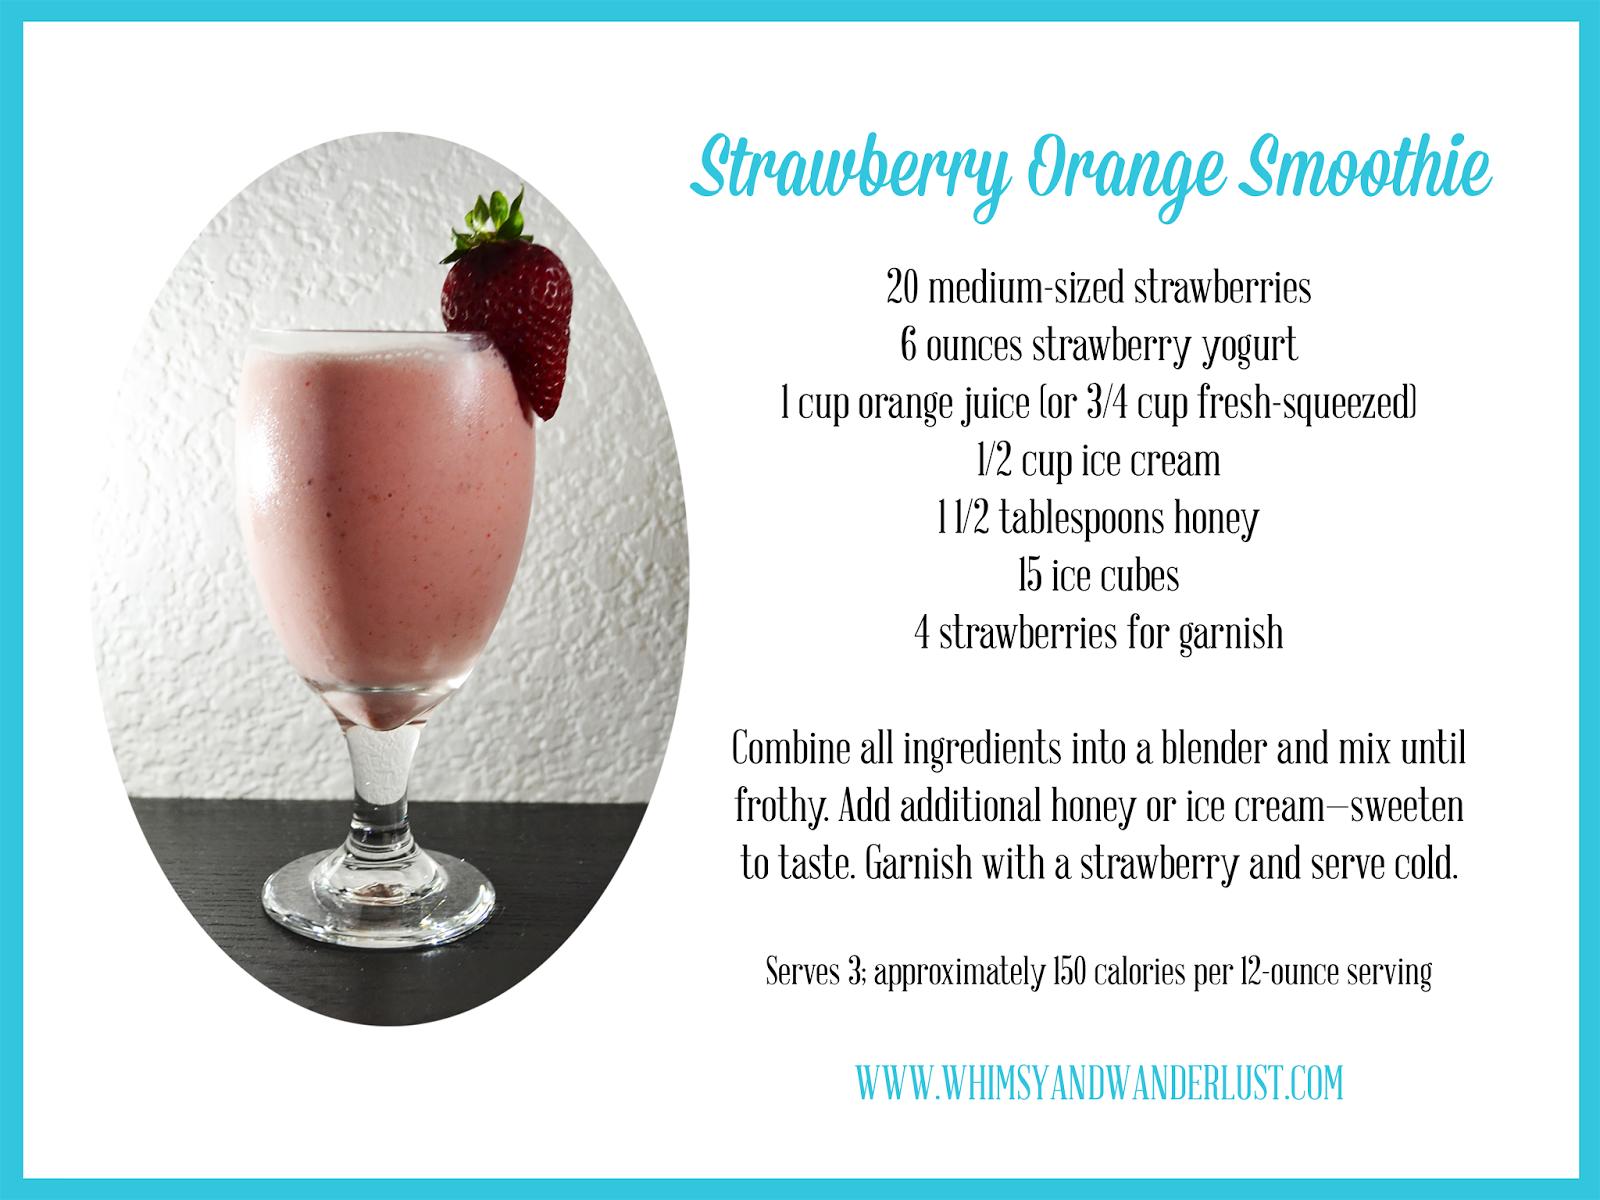 http://www.whimsyandwanderlust.com/2014/02/strawberry-orange-smoothie-recipe.html